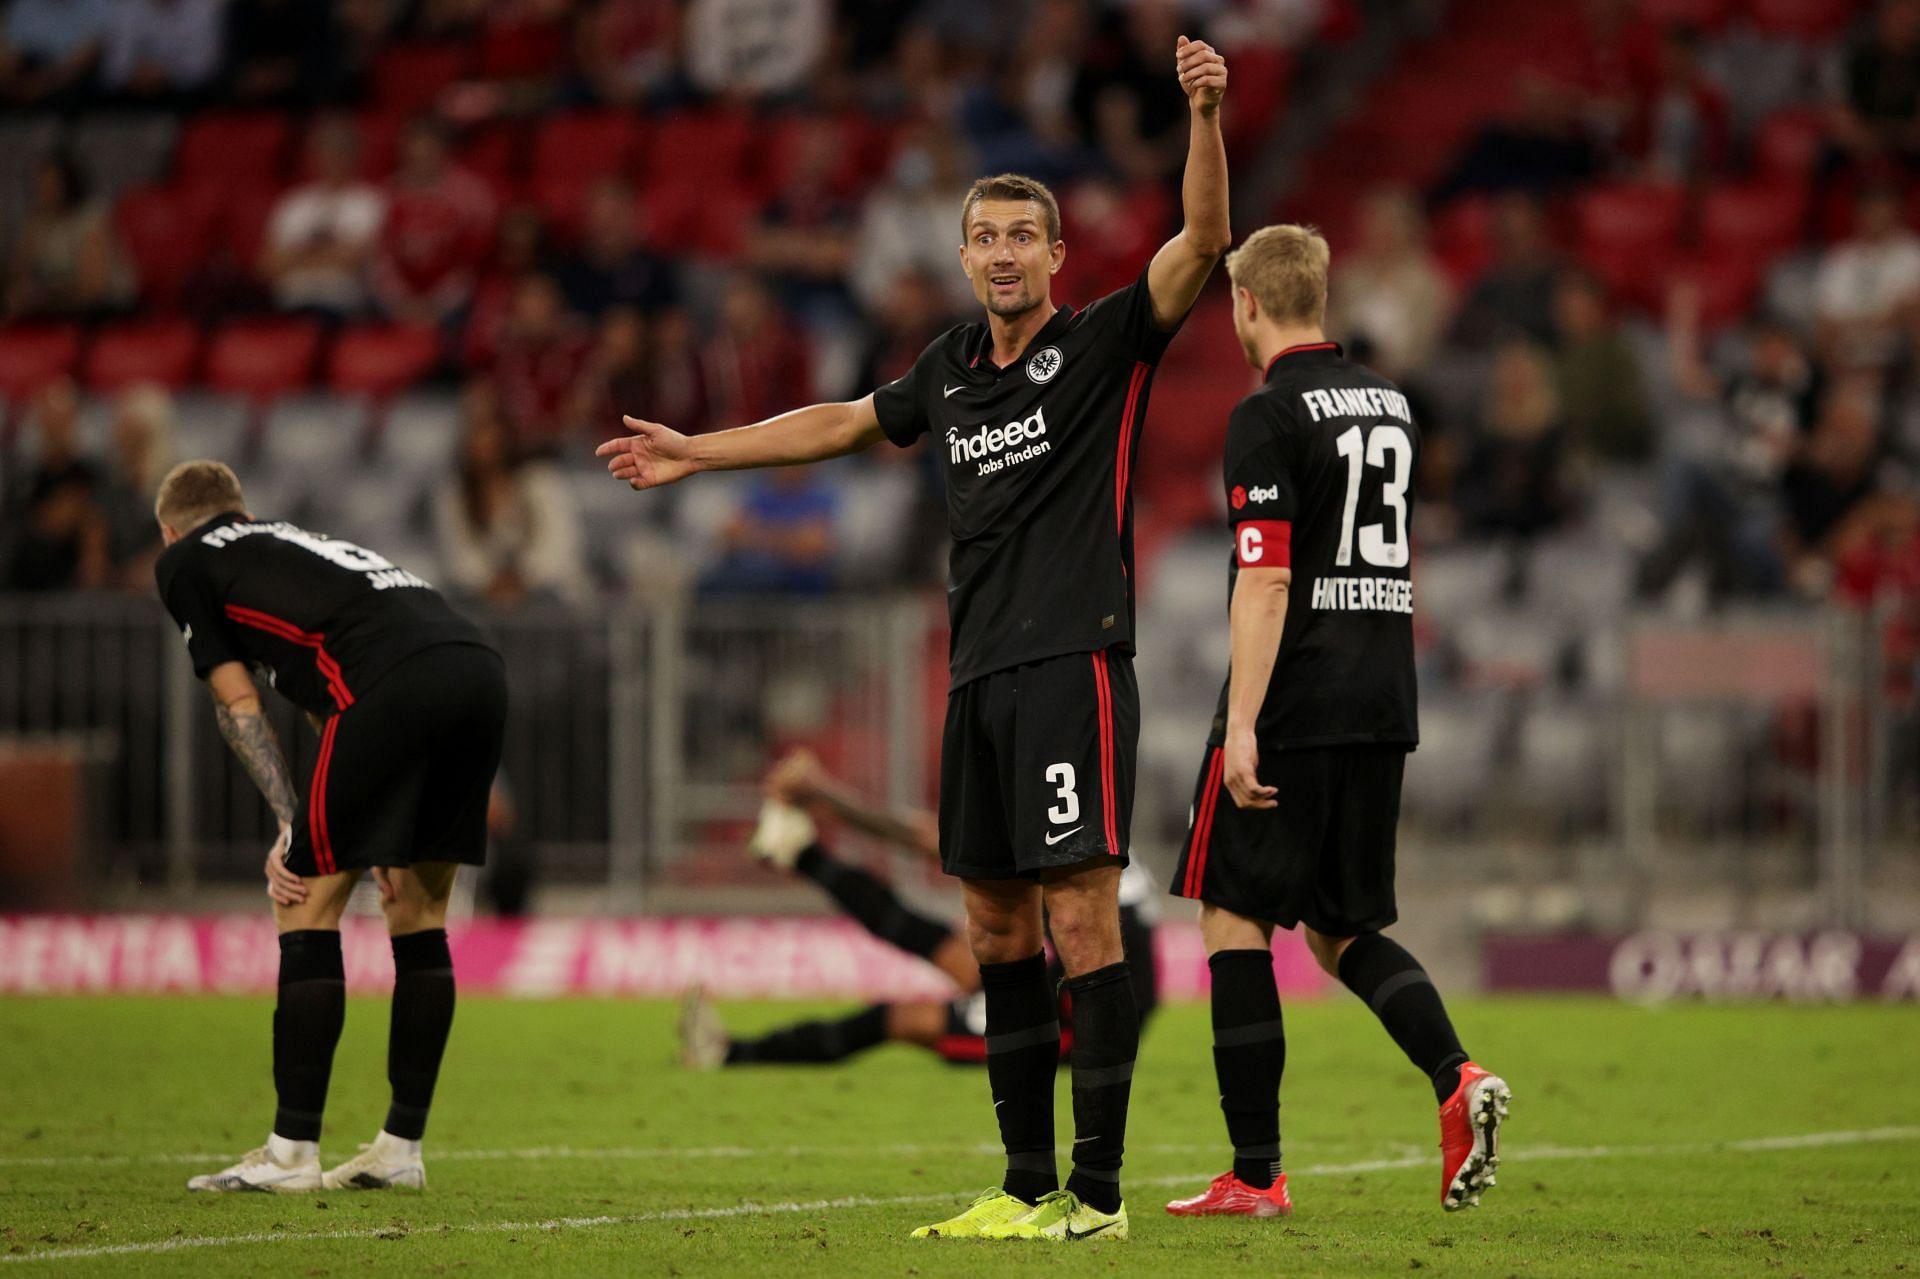 Eintracht Frankfurt will host Hertha Berlin on Saturday - Bundesliga